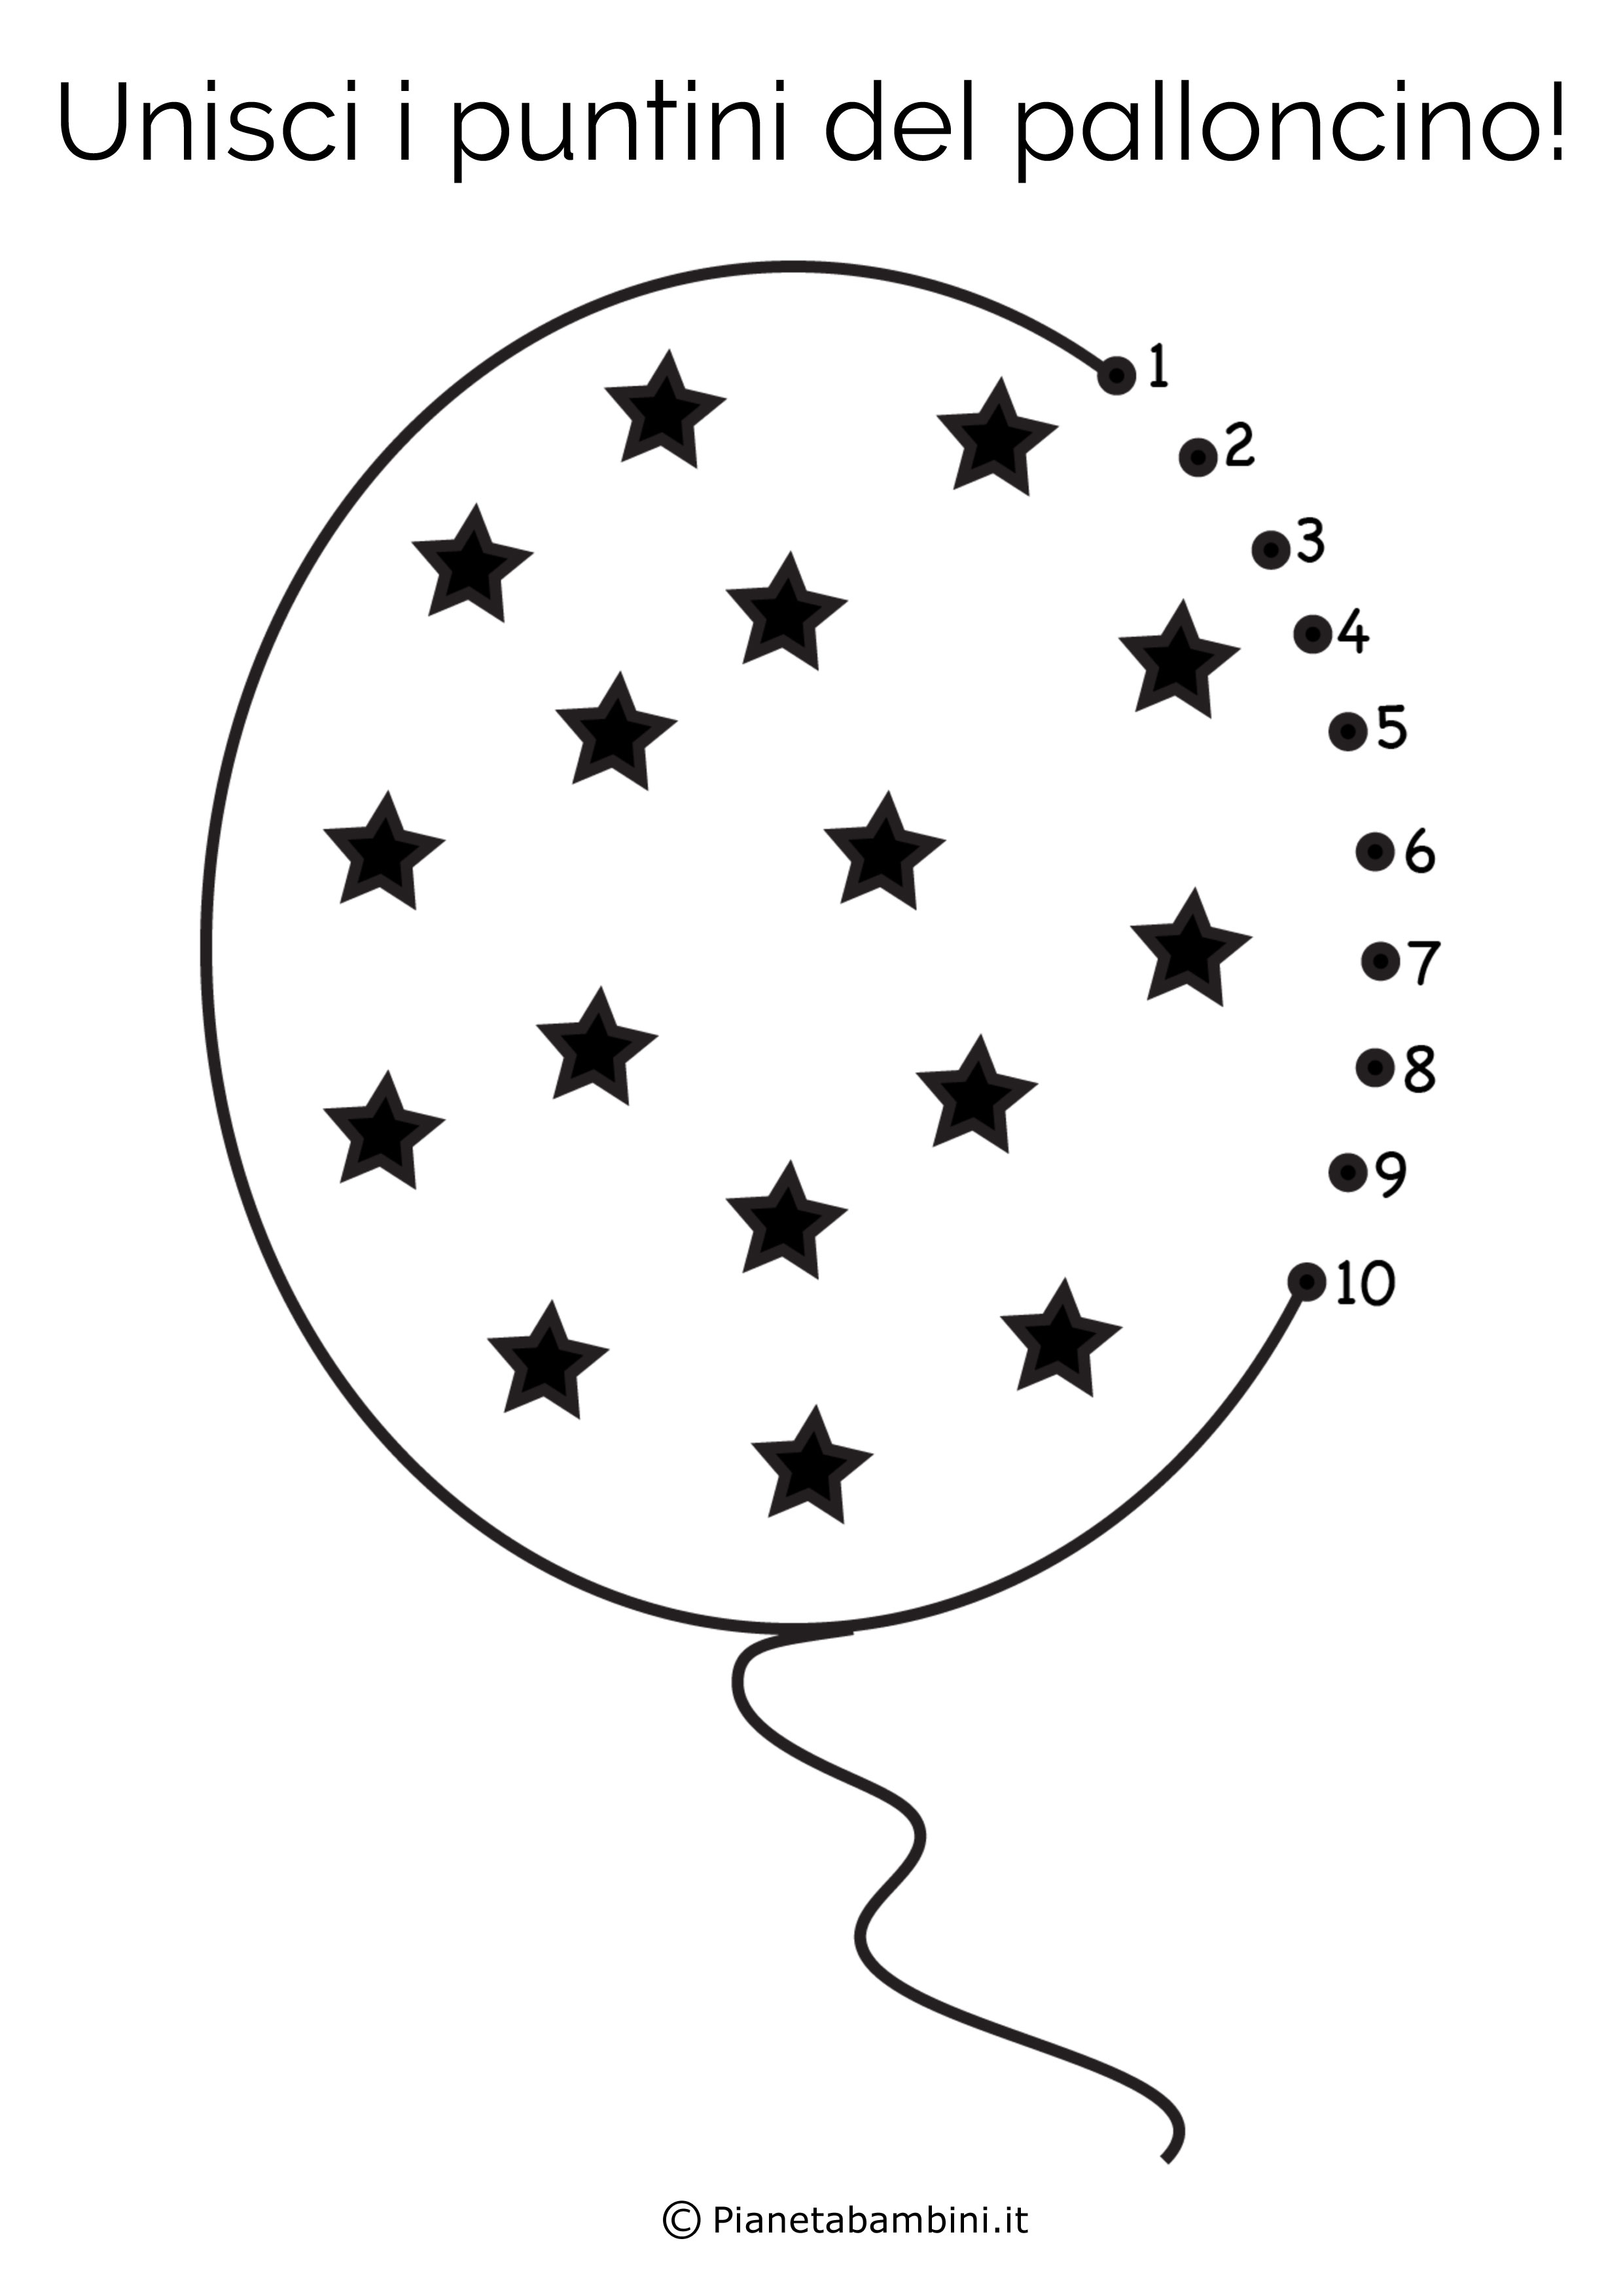 Disegno unisci i puntini palloncino